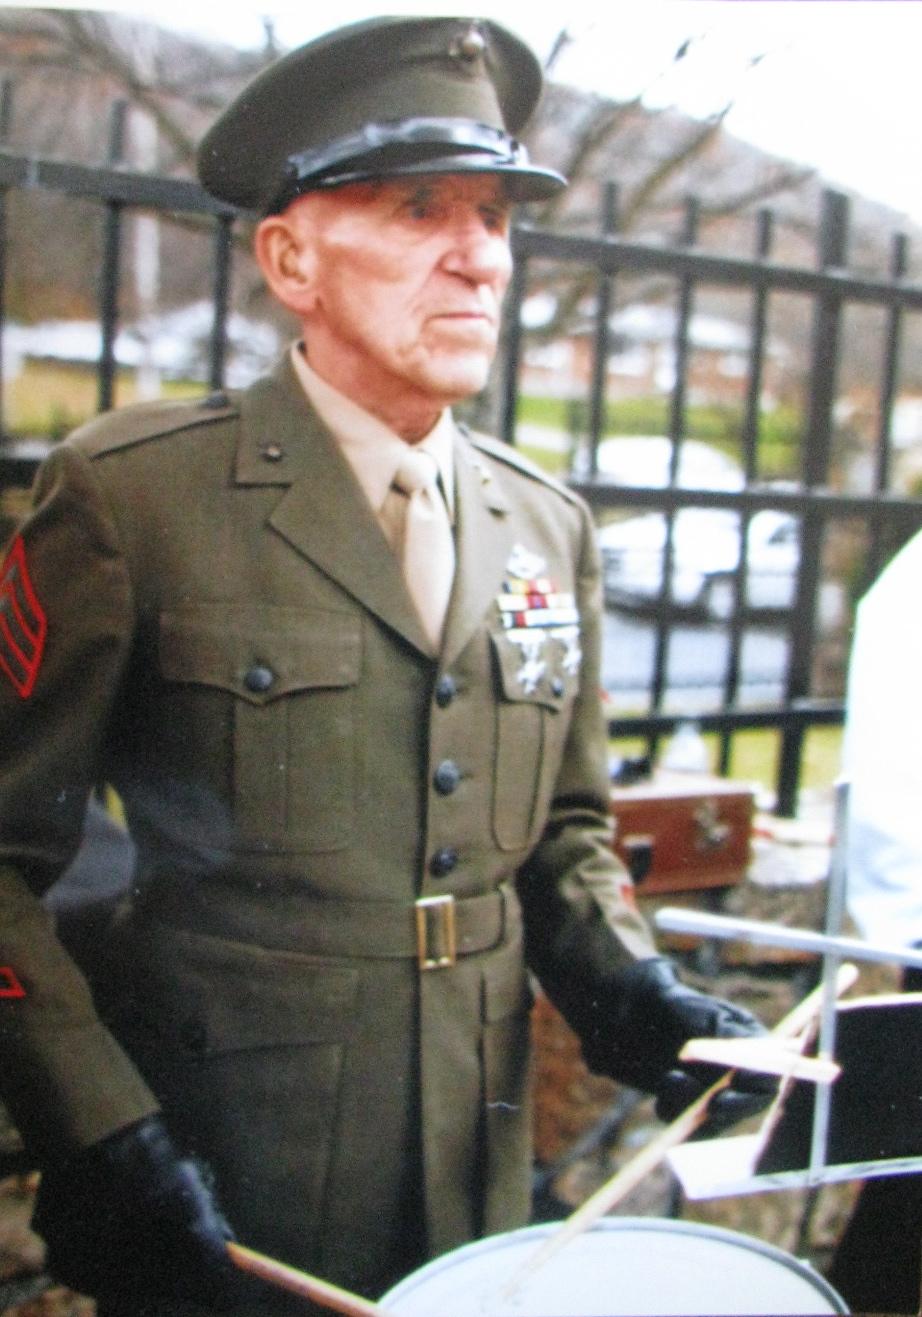 bill ditto was a marine aboard uss missouri when